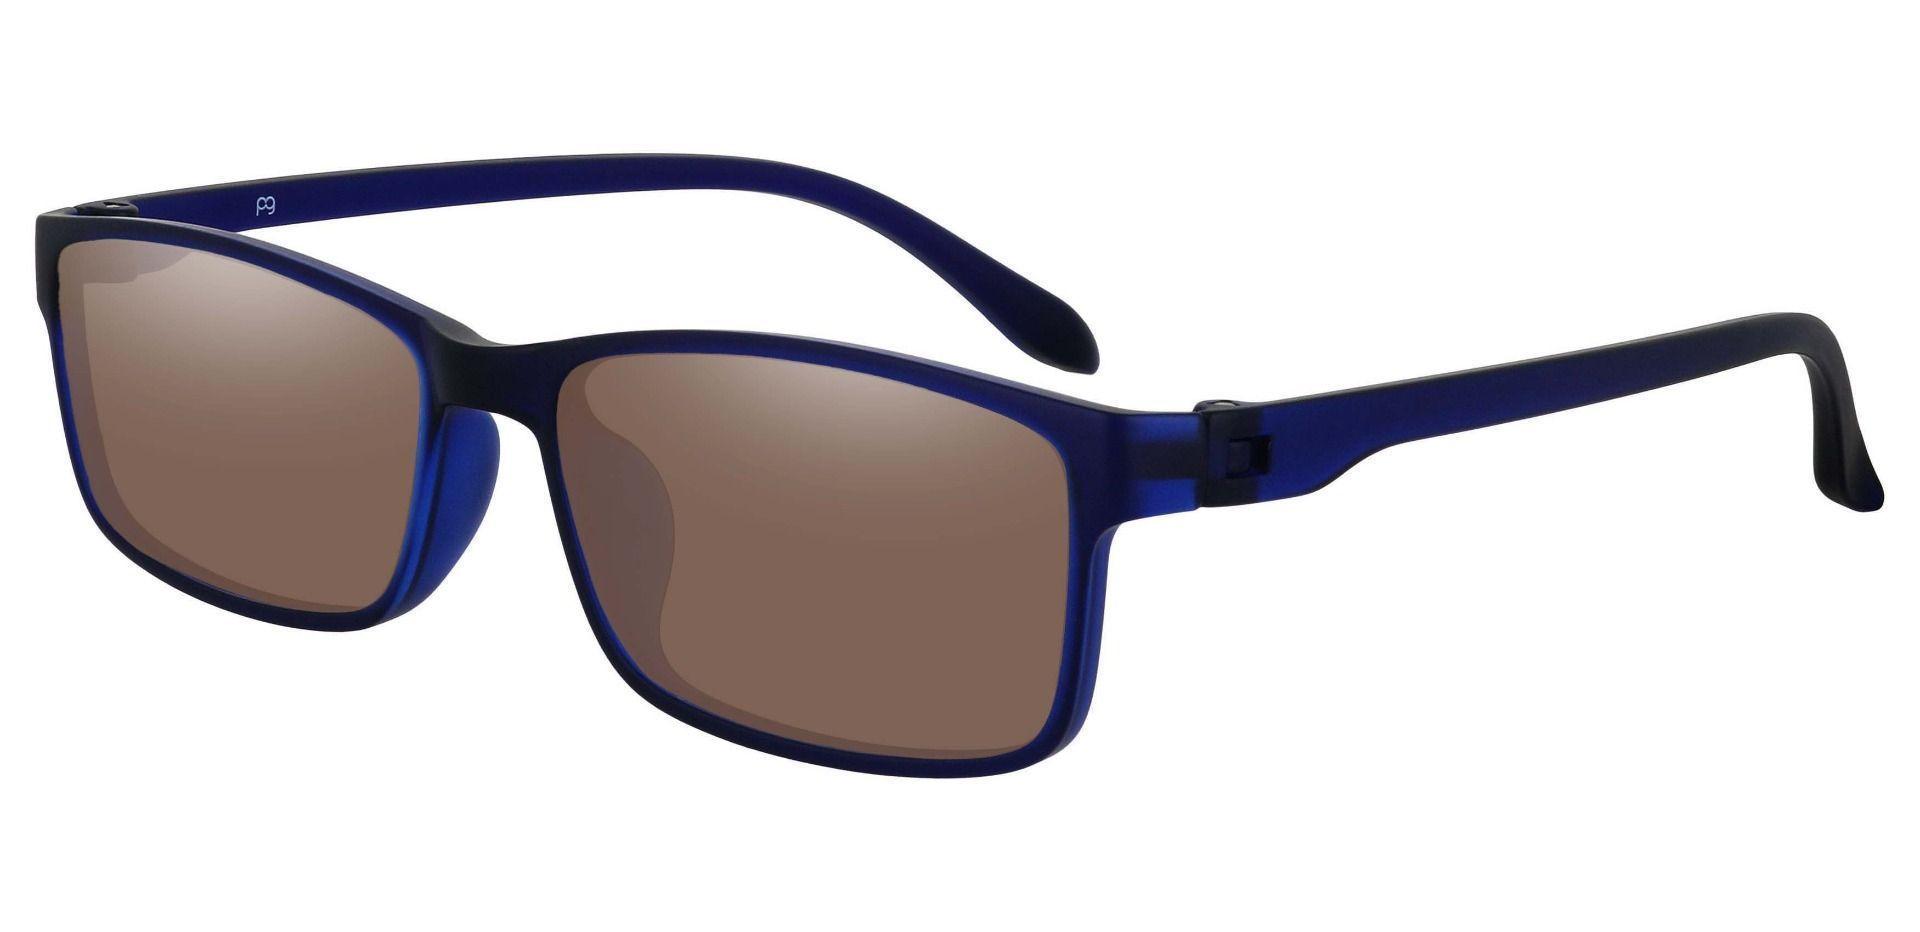 Candice Rectangle Prescription Sunglasses - Blue Frame With Brown Lenses